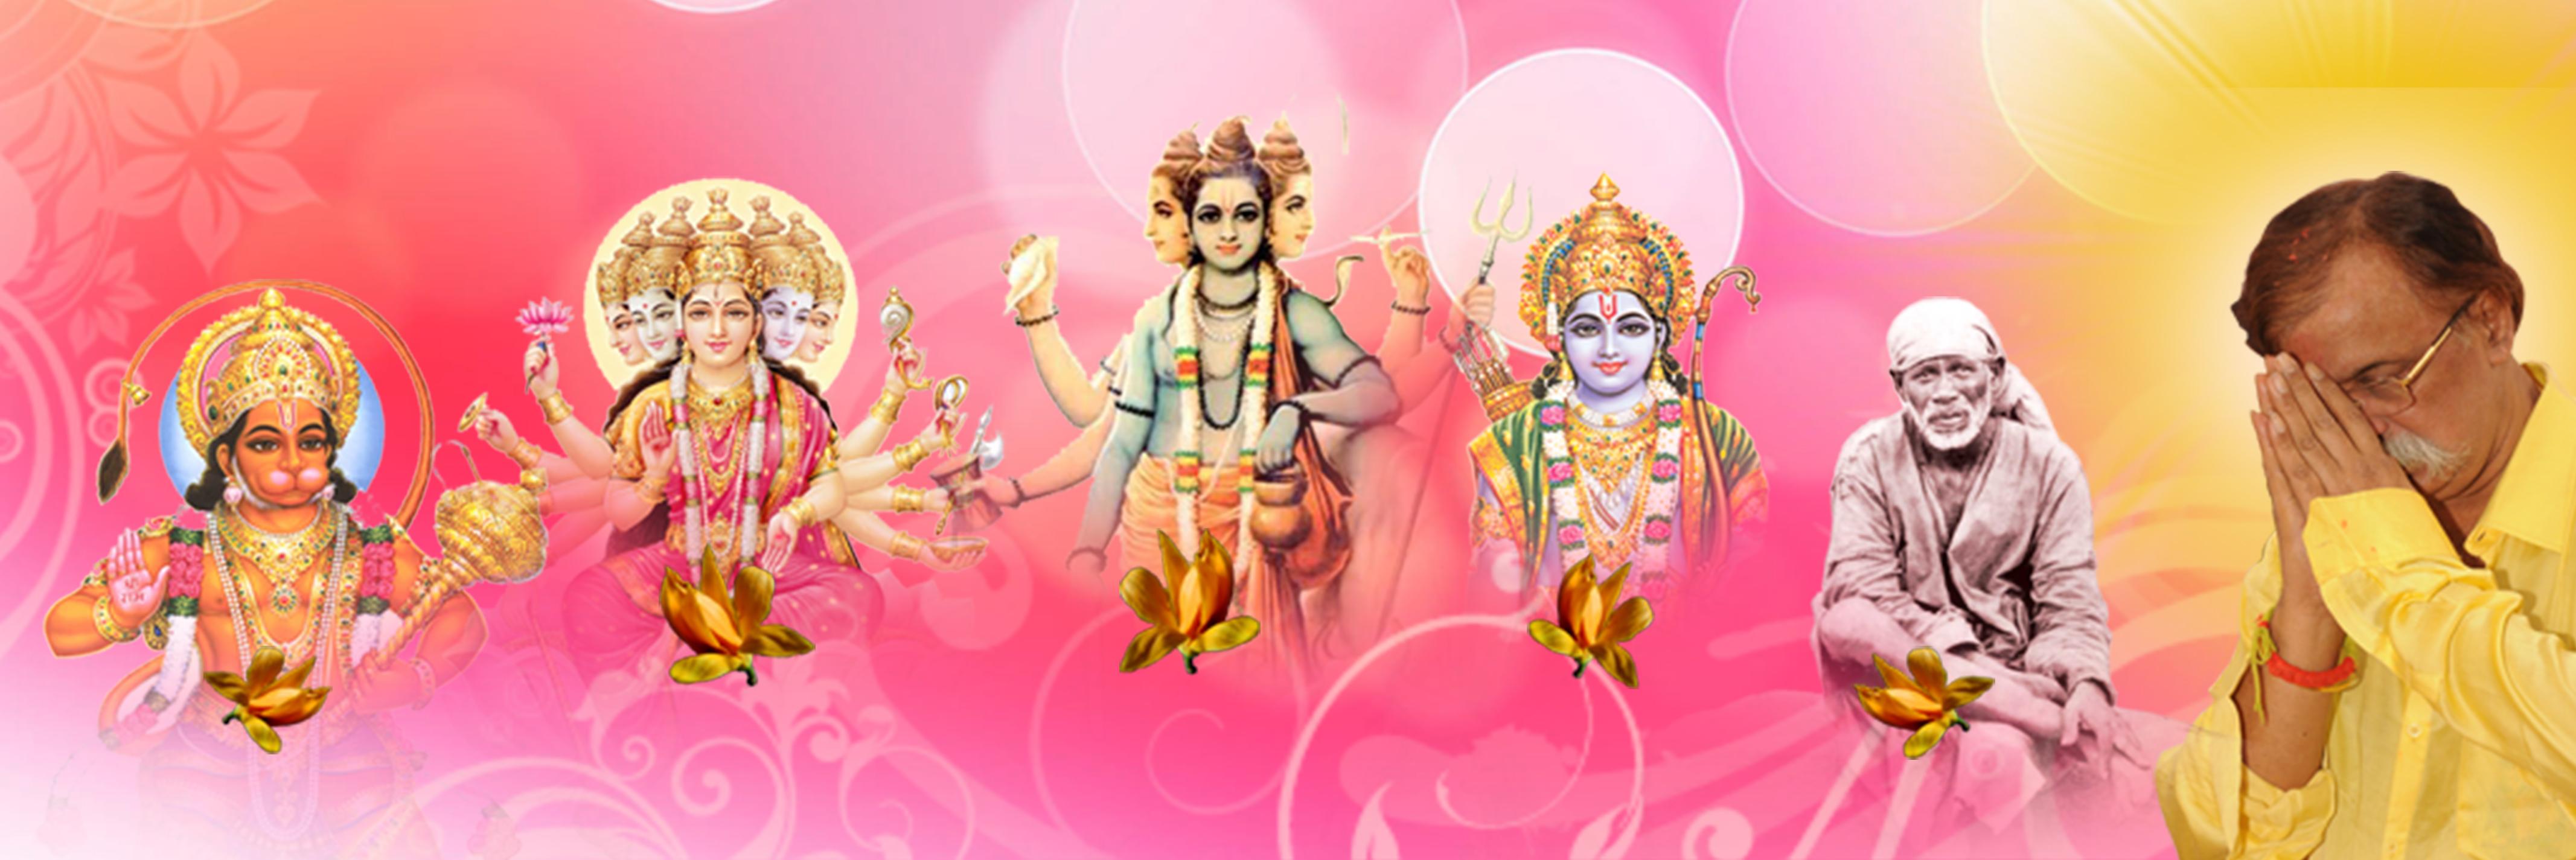 AniruddhaFoundation-Panchagurus-His Five Gurus